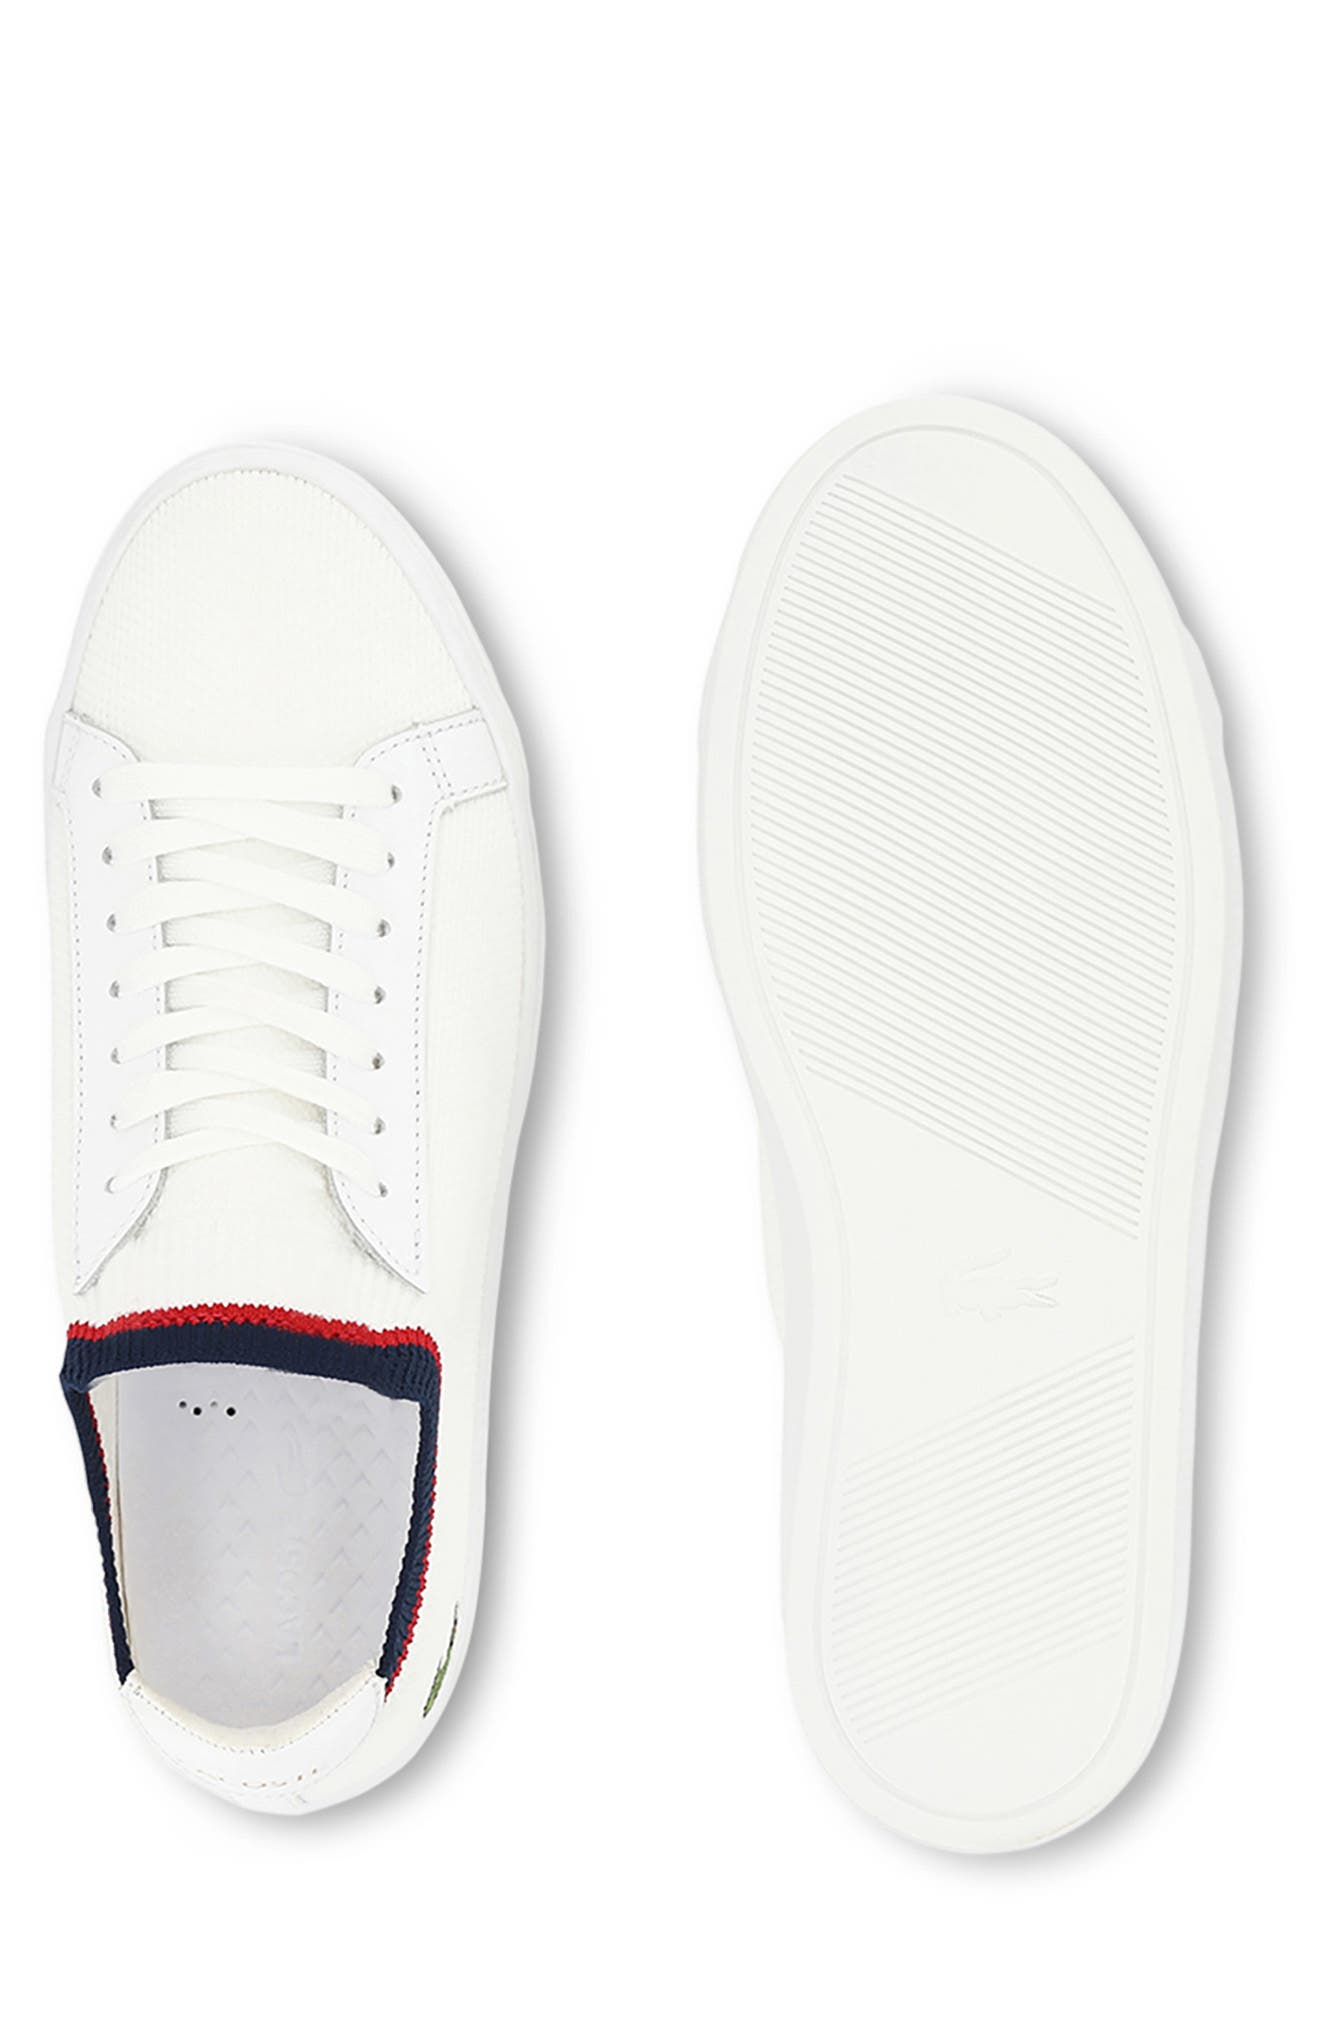 LACOSTE, Piqué Knit Sneaker, Alternate thumbnail 9, color, WHITE/ NAVY/ RED